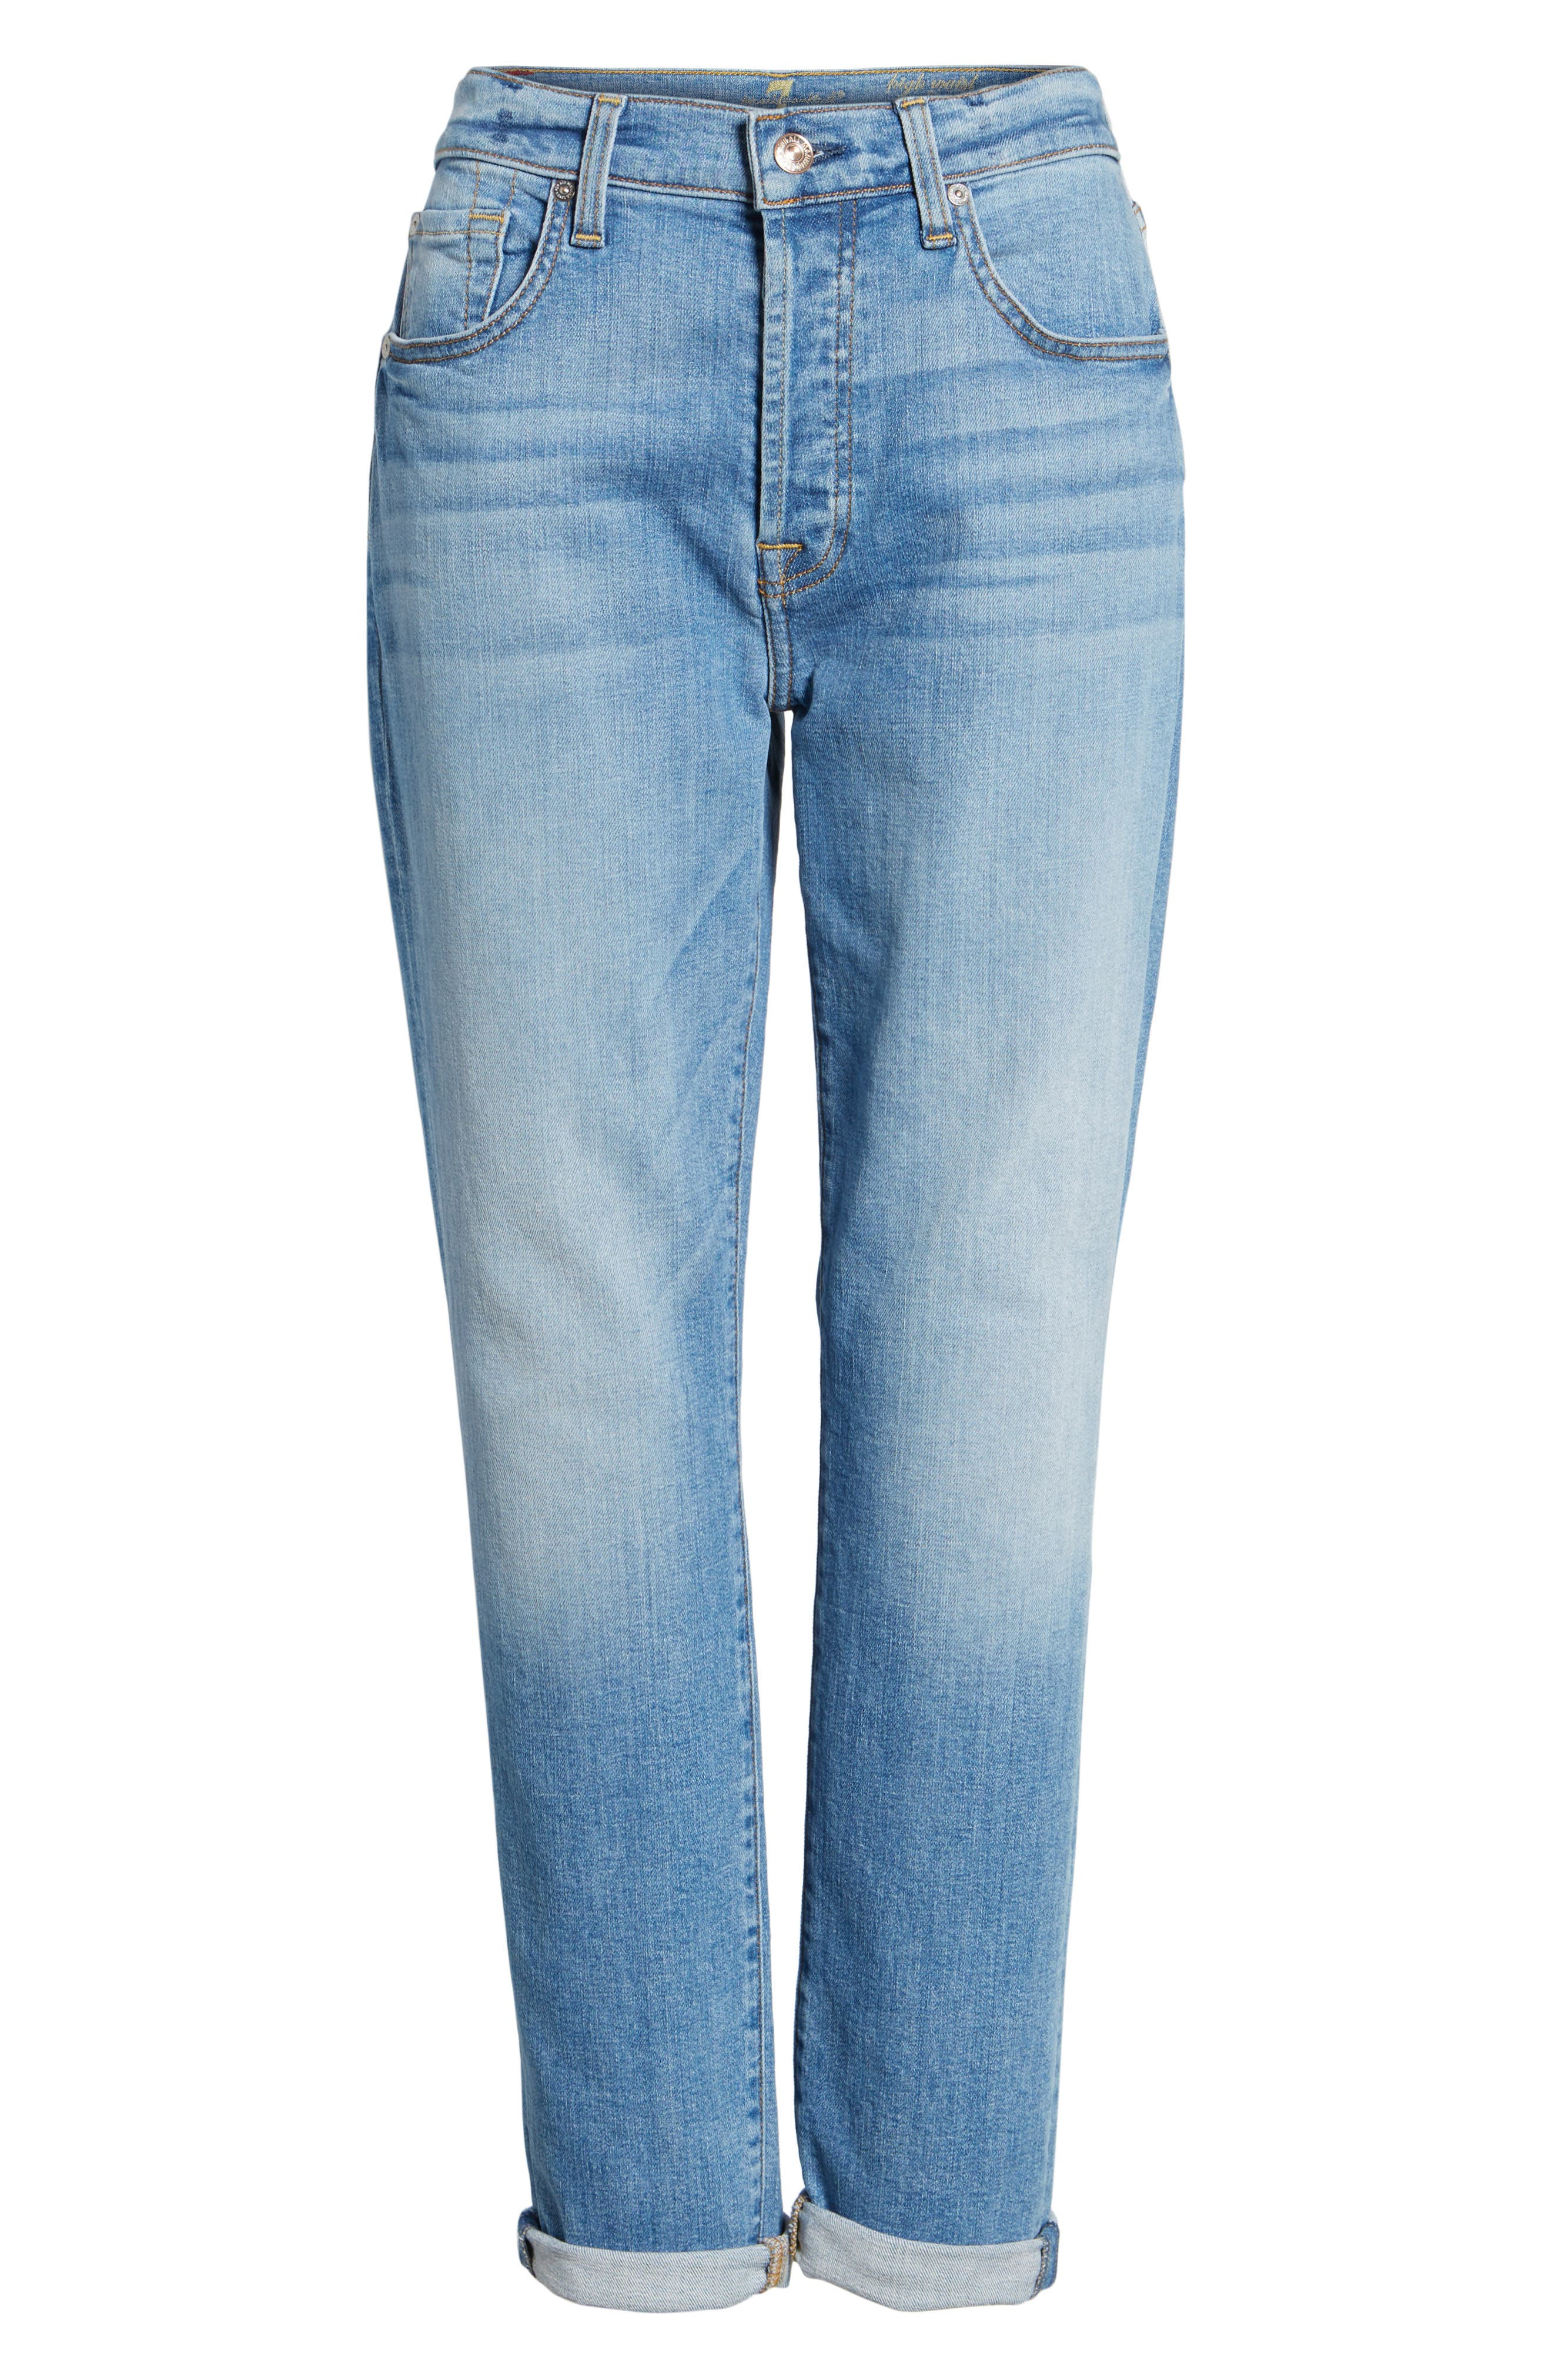 Josefina High Waist Crop Boyfriend Jeans,                             Alternate thumbnail 6, color,                             East Village